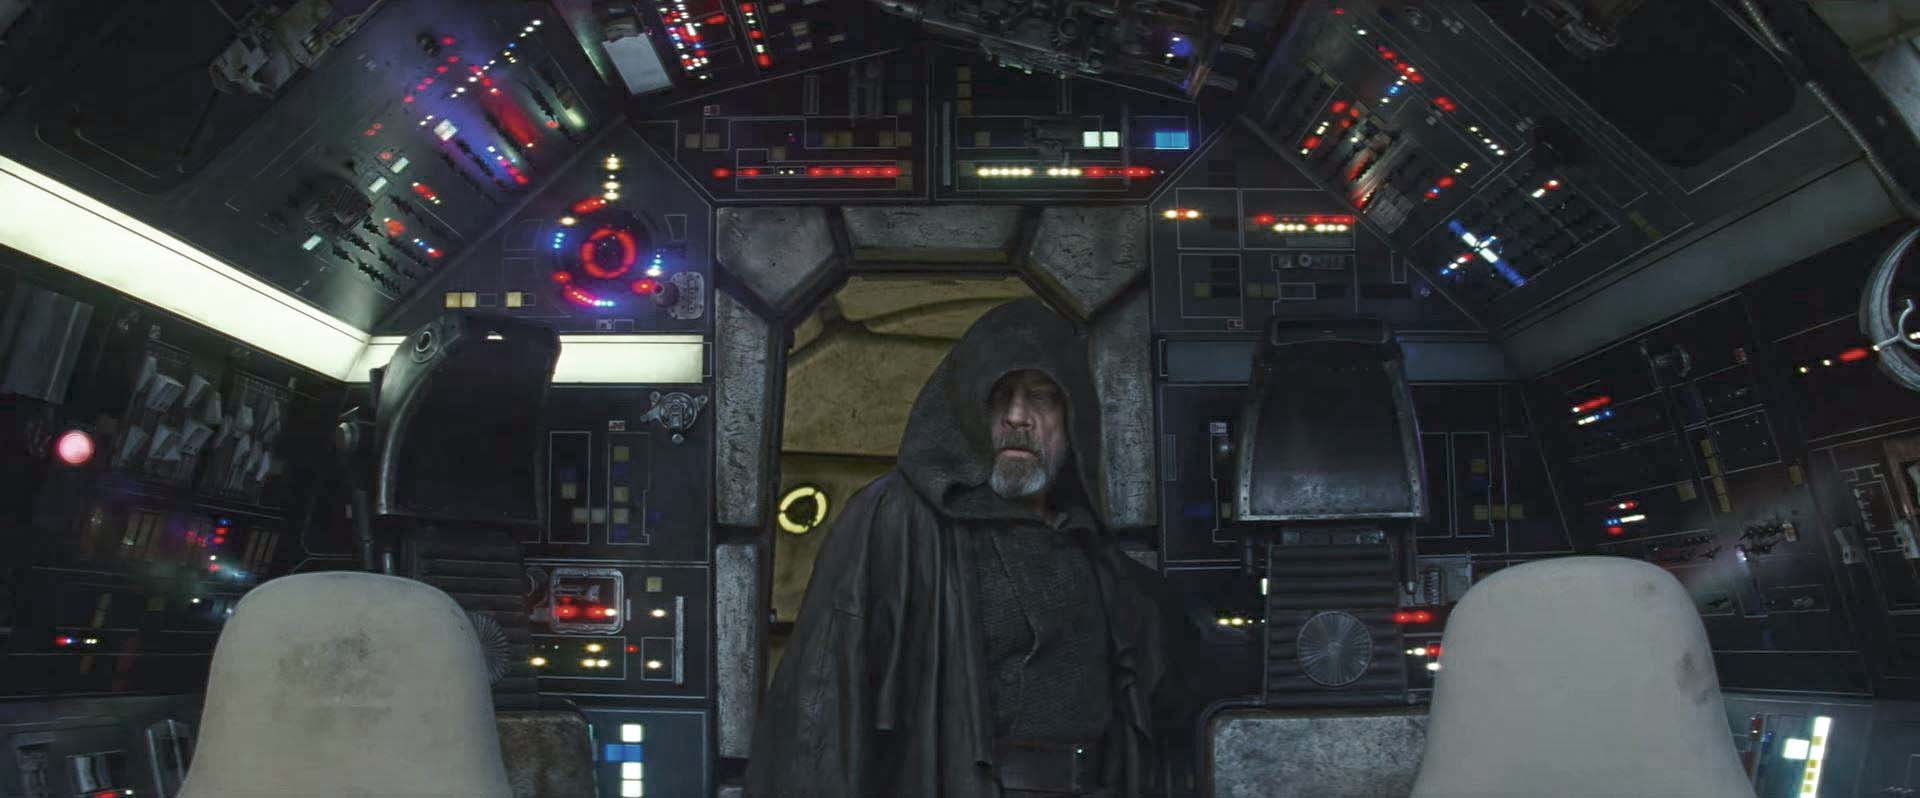 mark hamill clone luke star wars the last jedi millennium falcon luke skywalker trailer